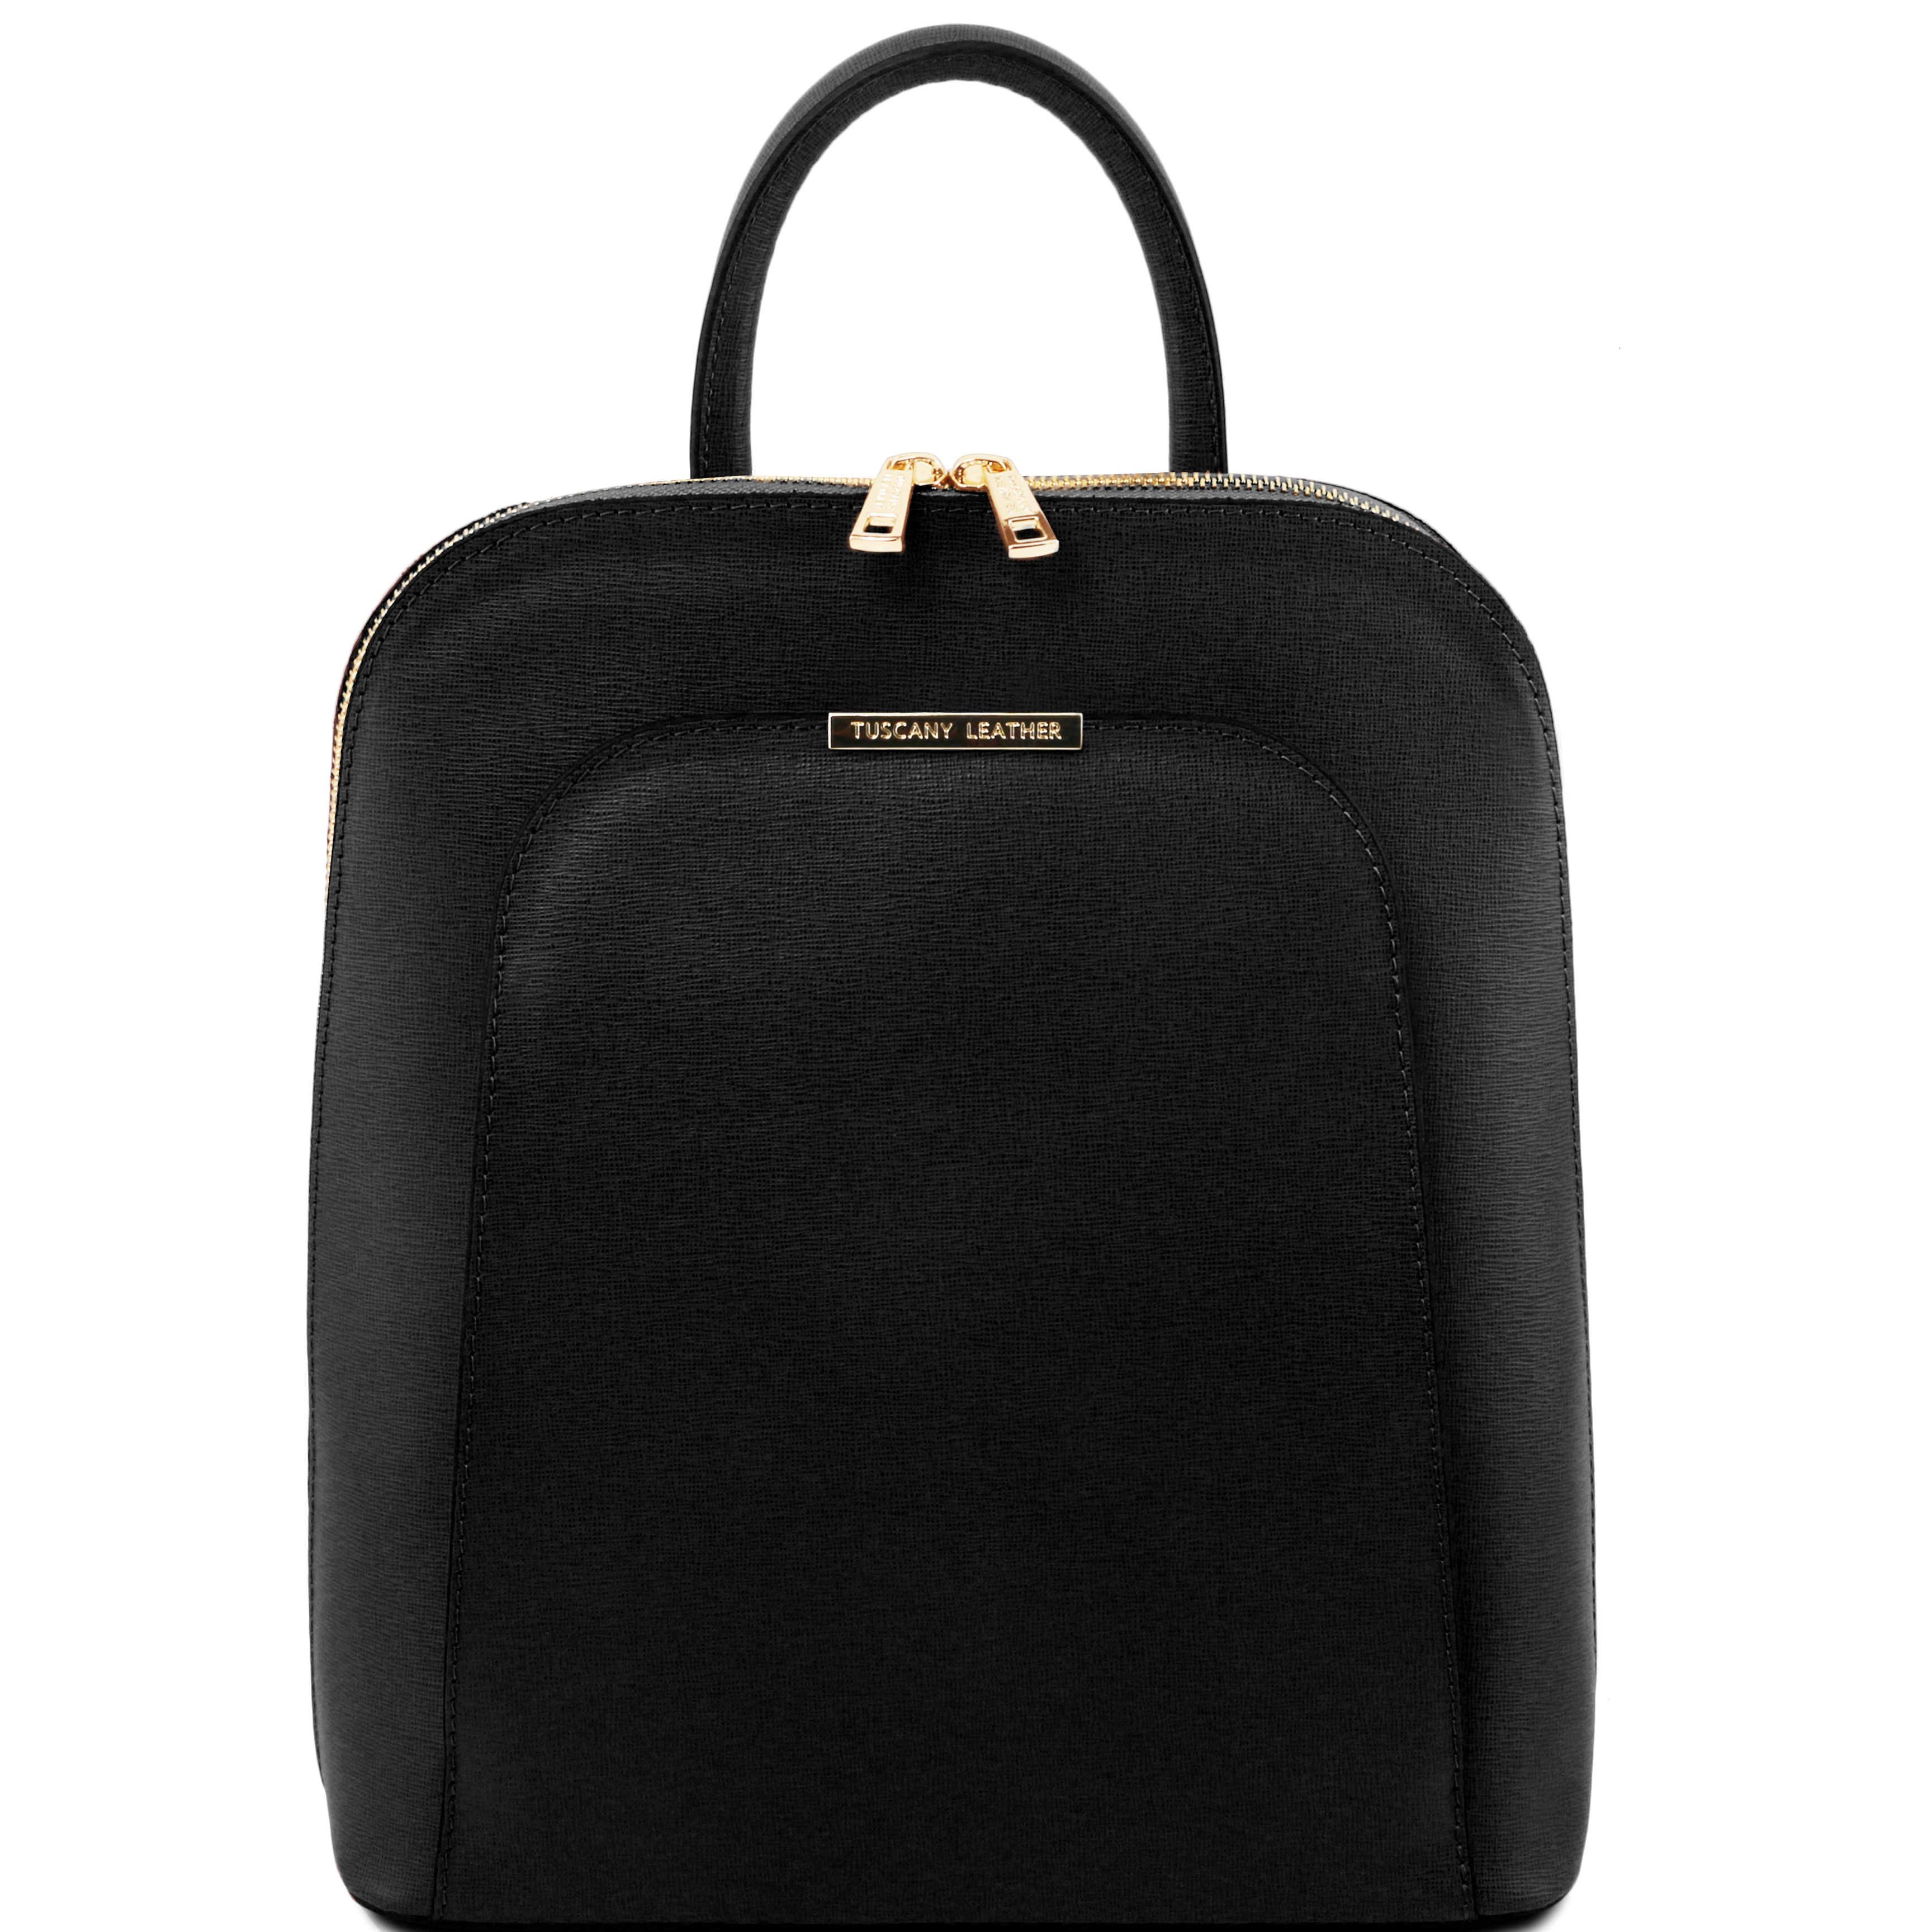 TL BAG - Rucsac negru din piele saffiano